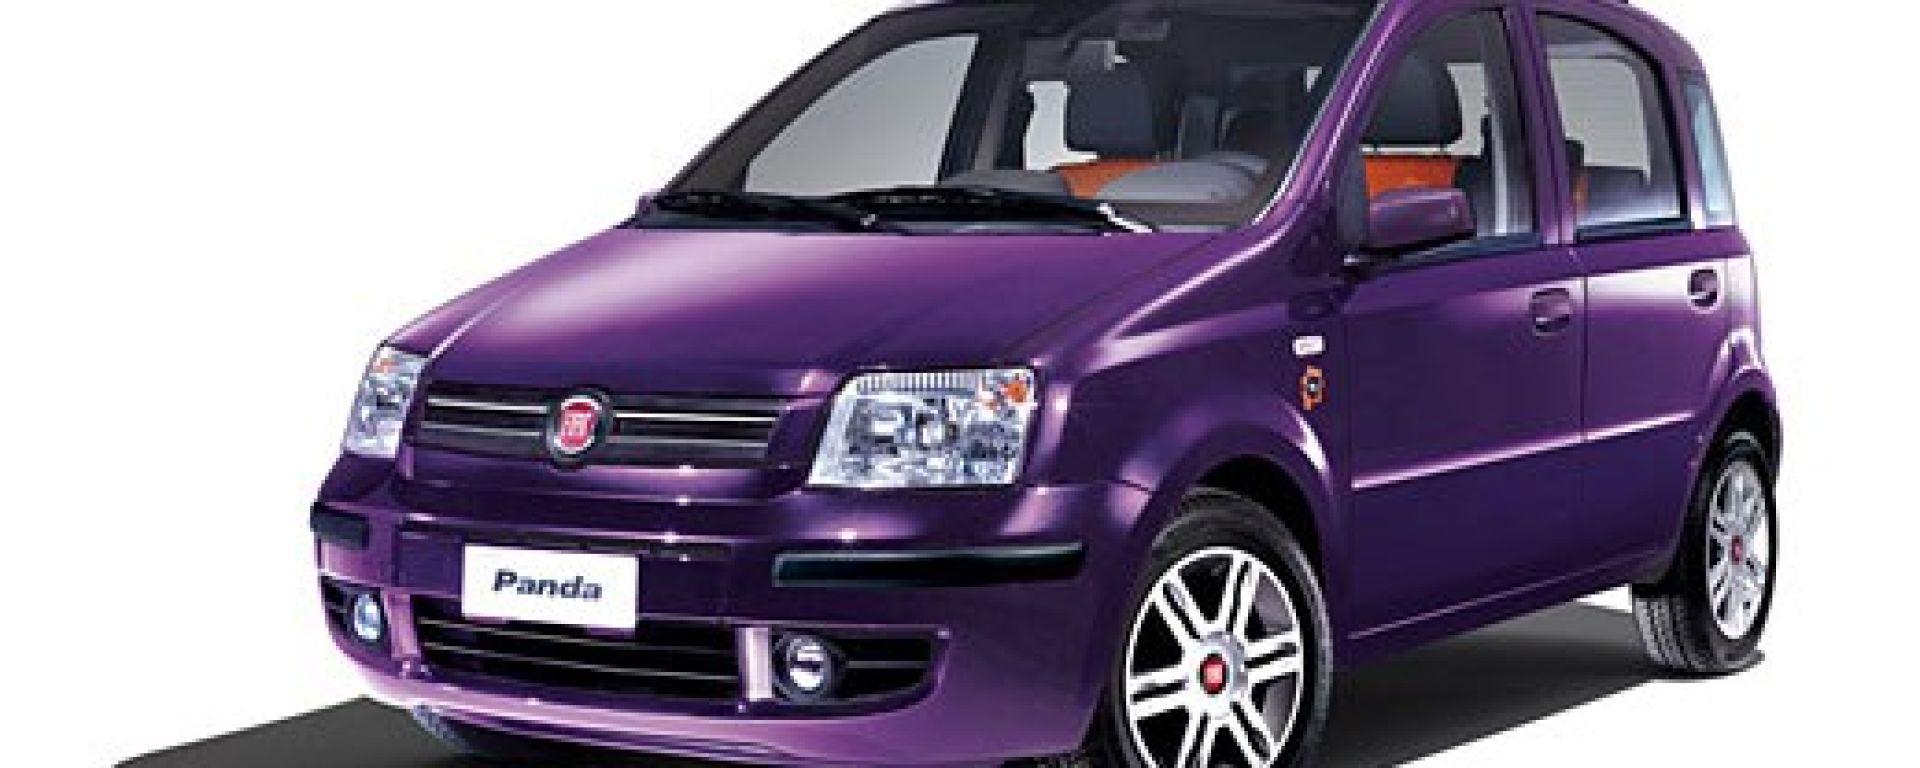 Prossimamente Fiat Panda Mamy Motorbox